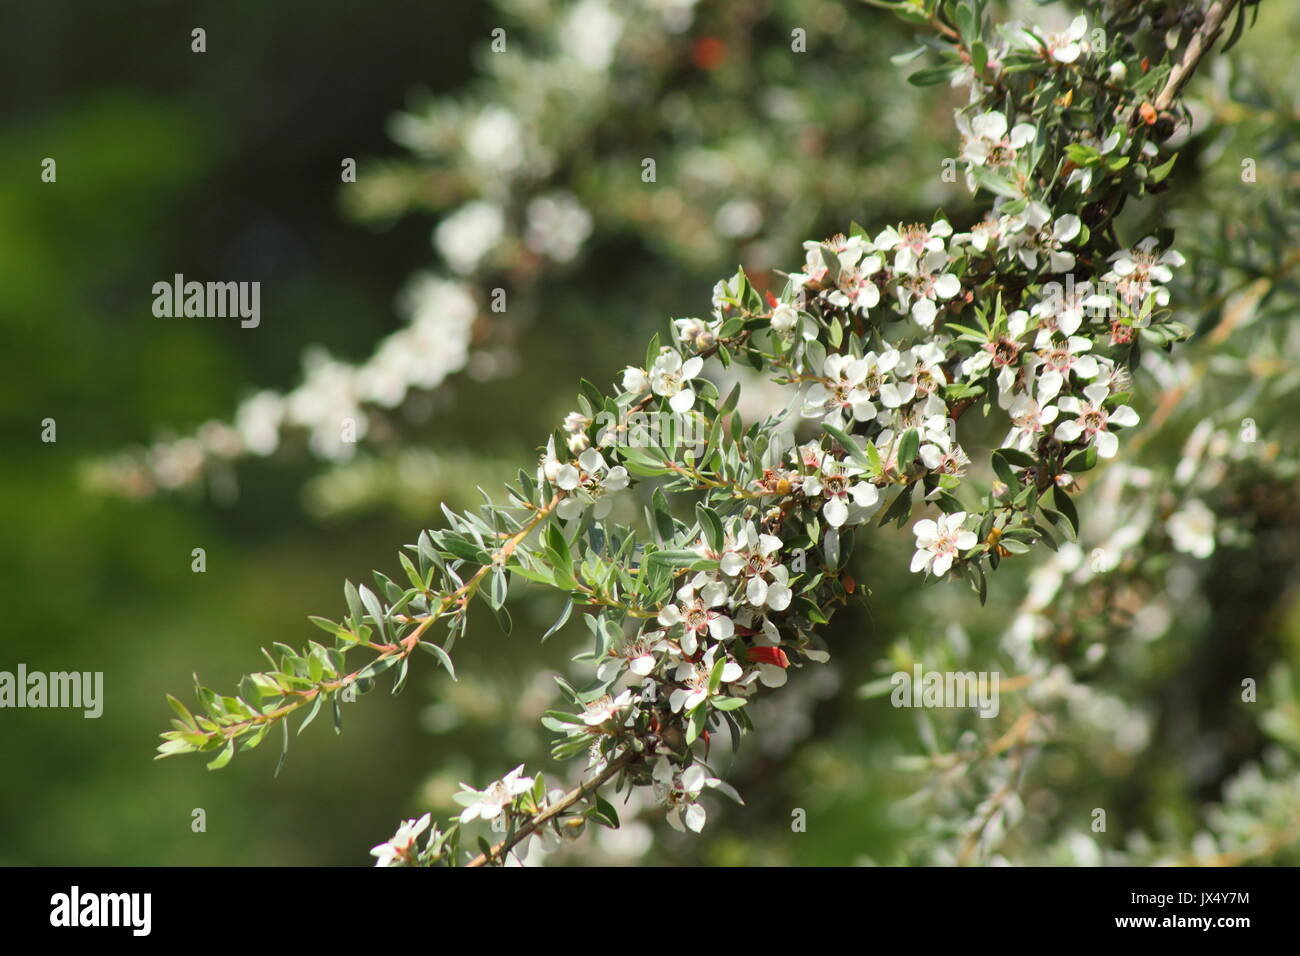 Rbol de t lanudo leptospermum lanigerum un arbusto for Arboles de hoja perenne en galicia